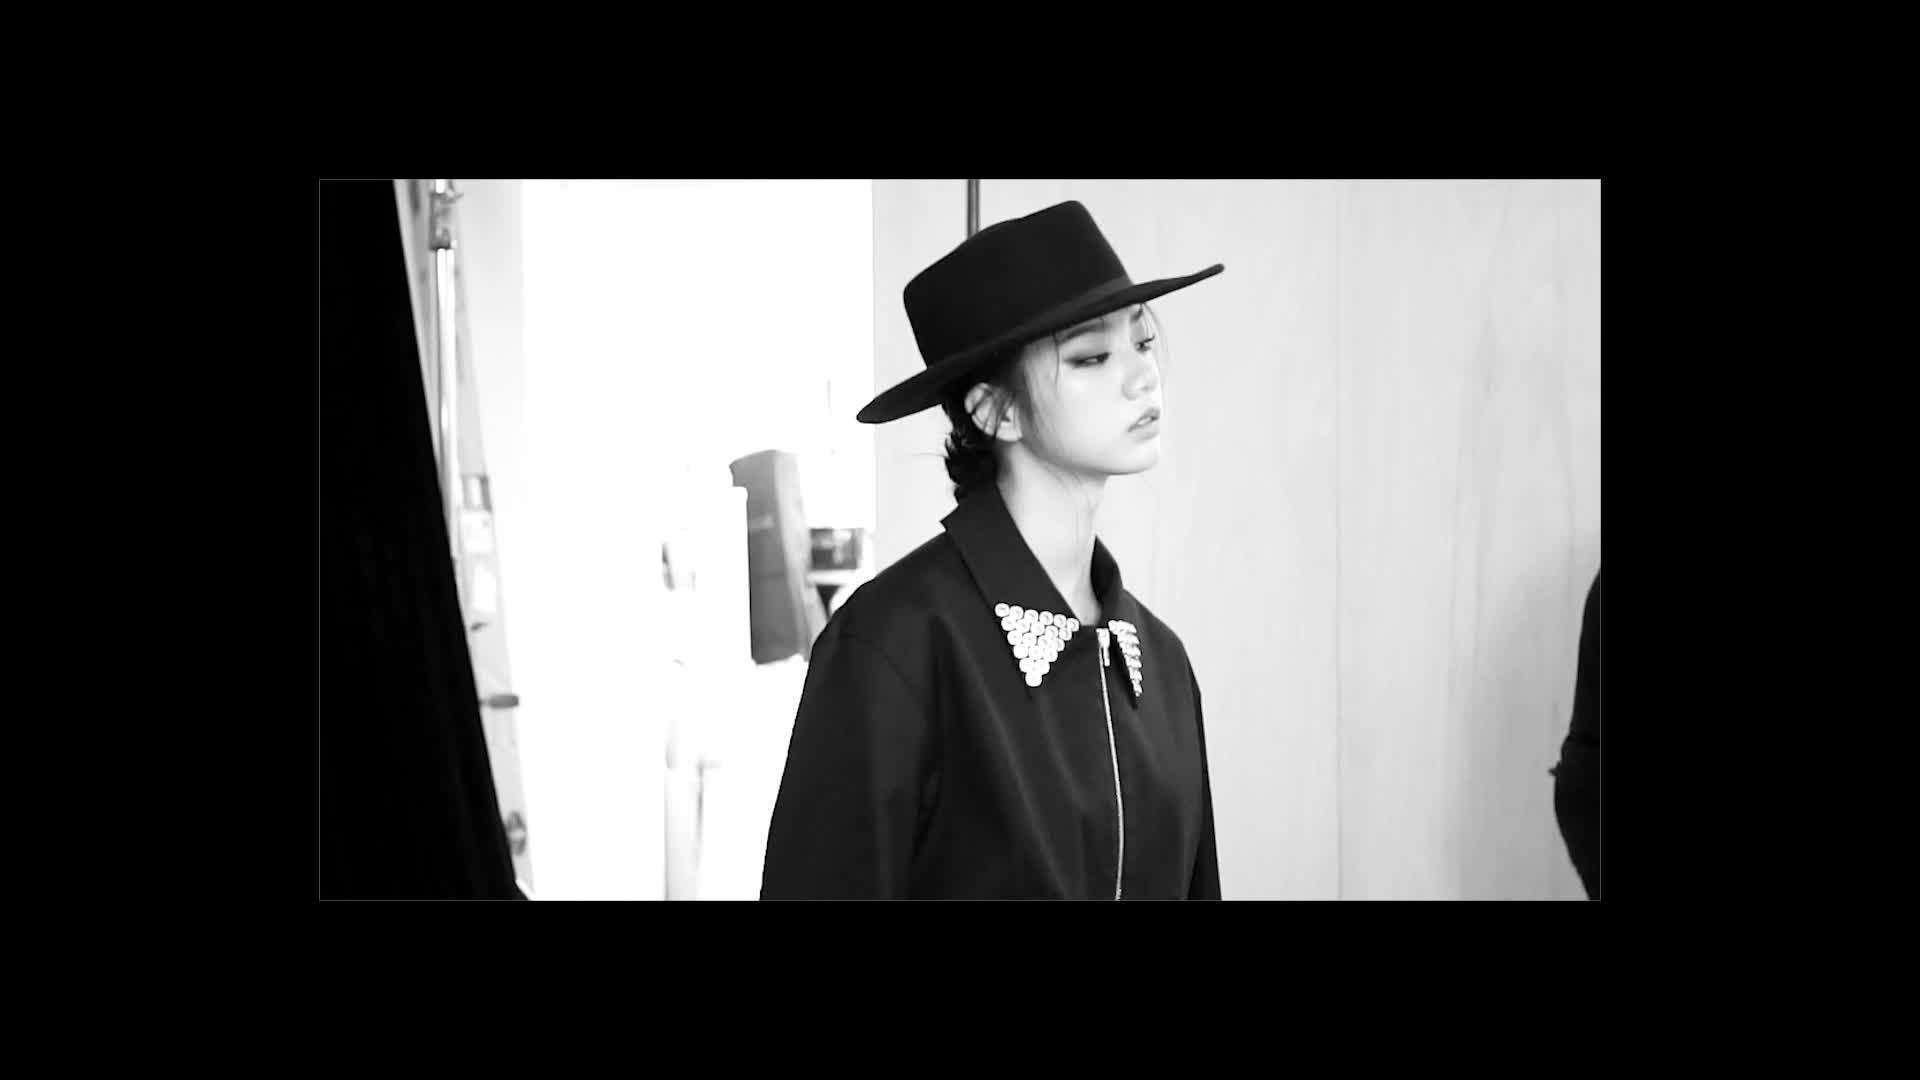 [T-CUT] HYERI(Girl's day) Photoshoot Behind